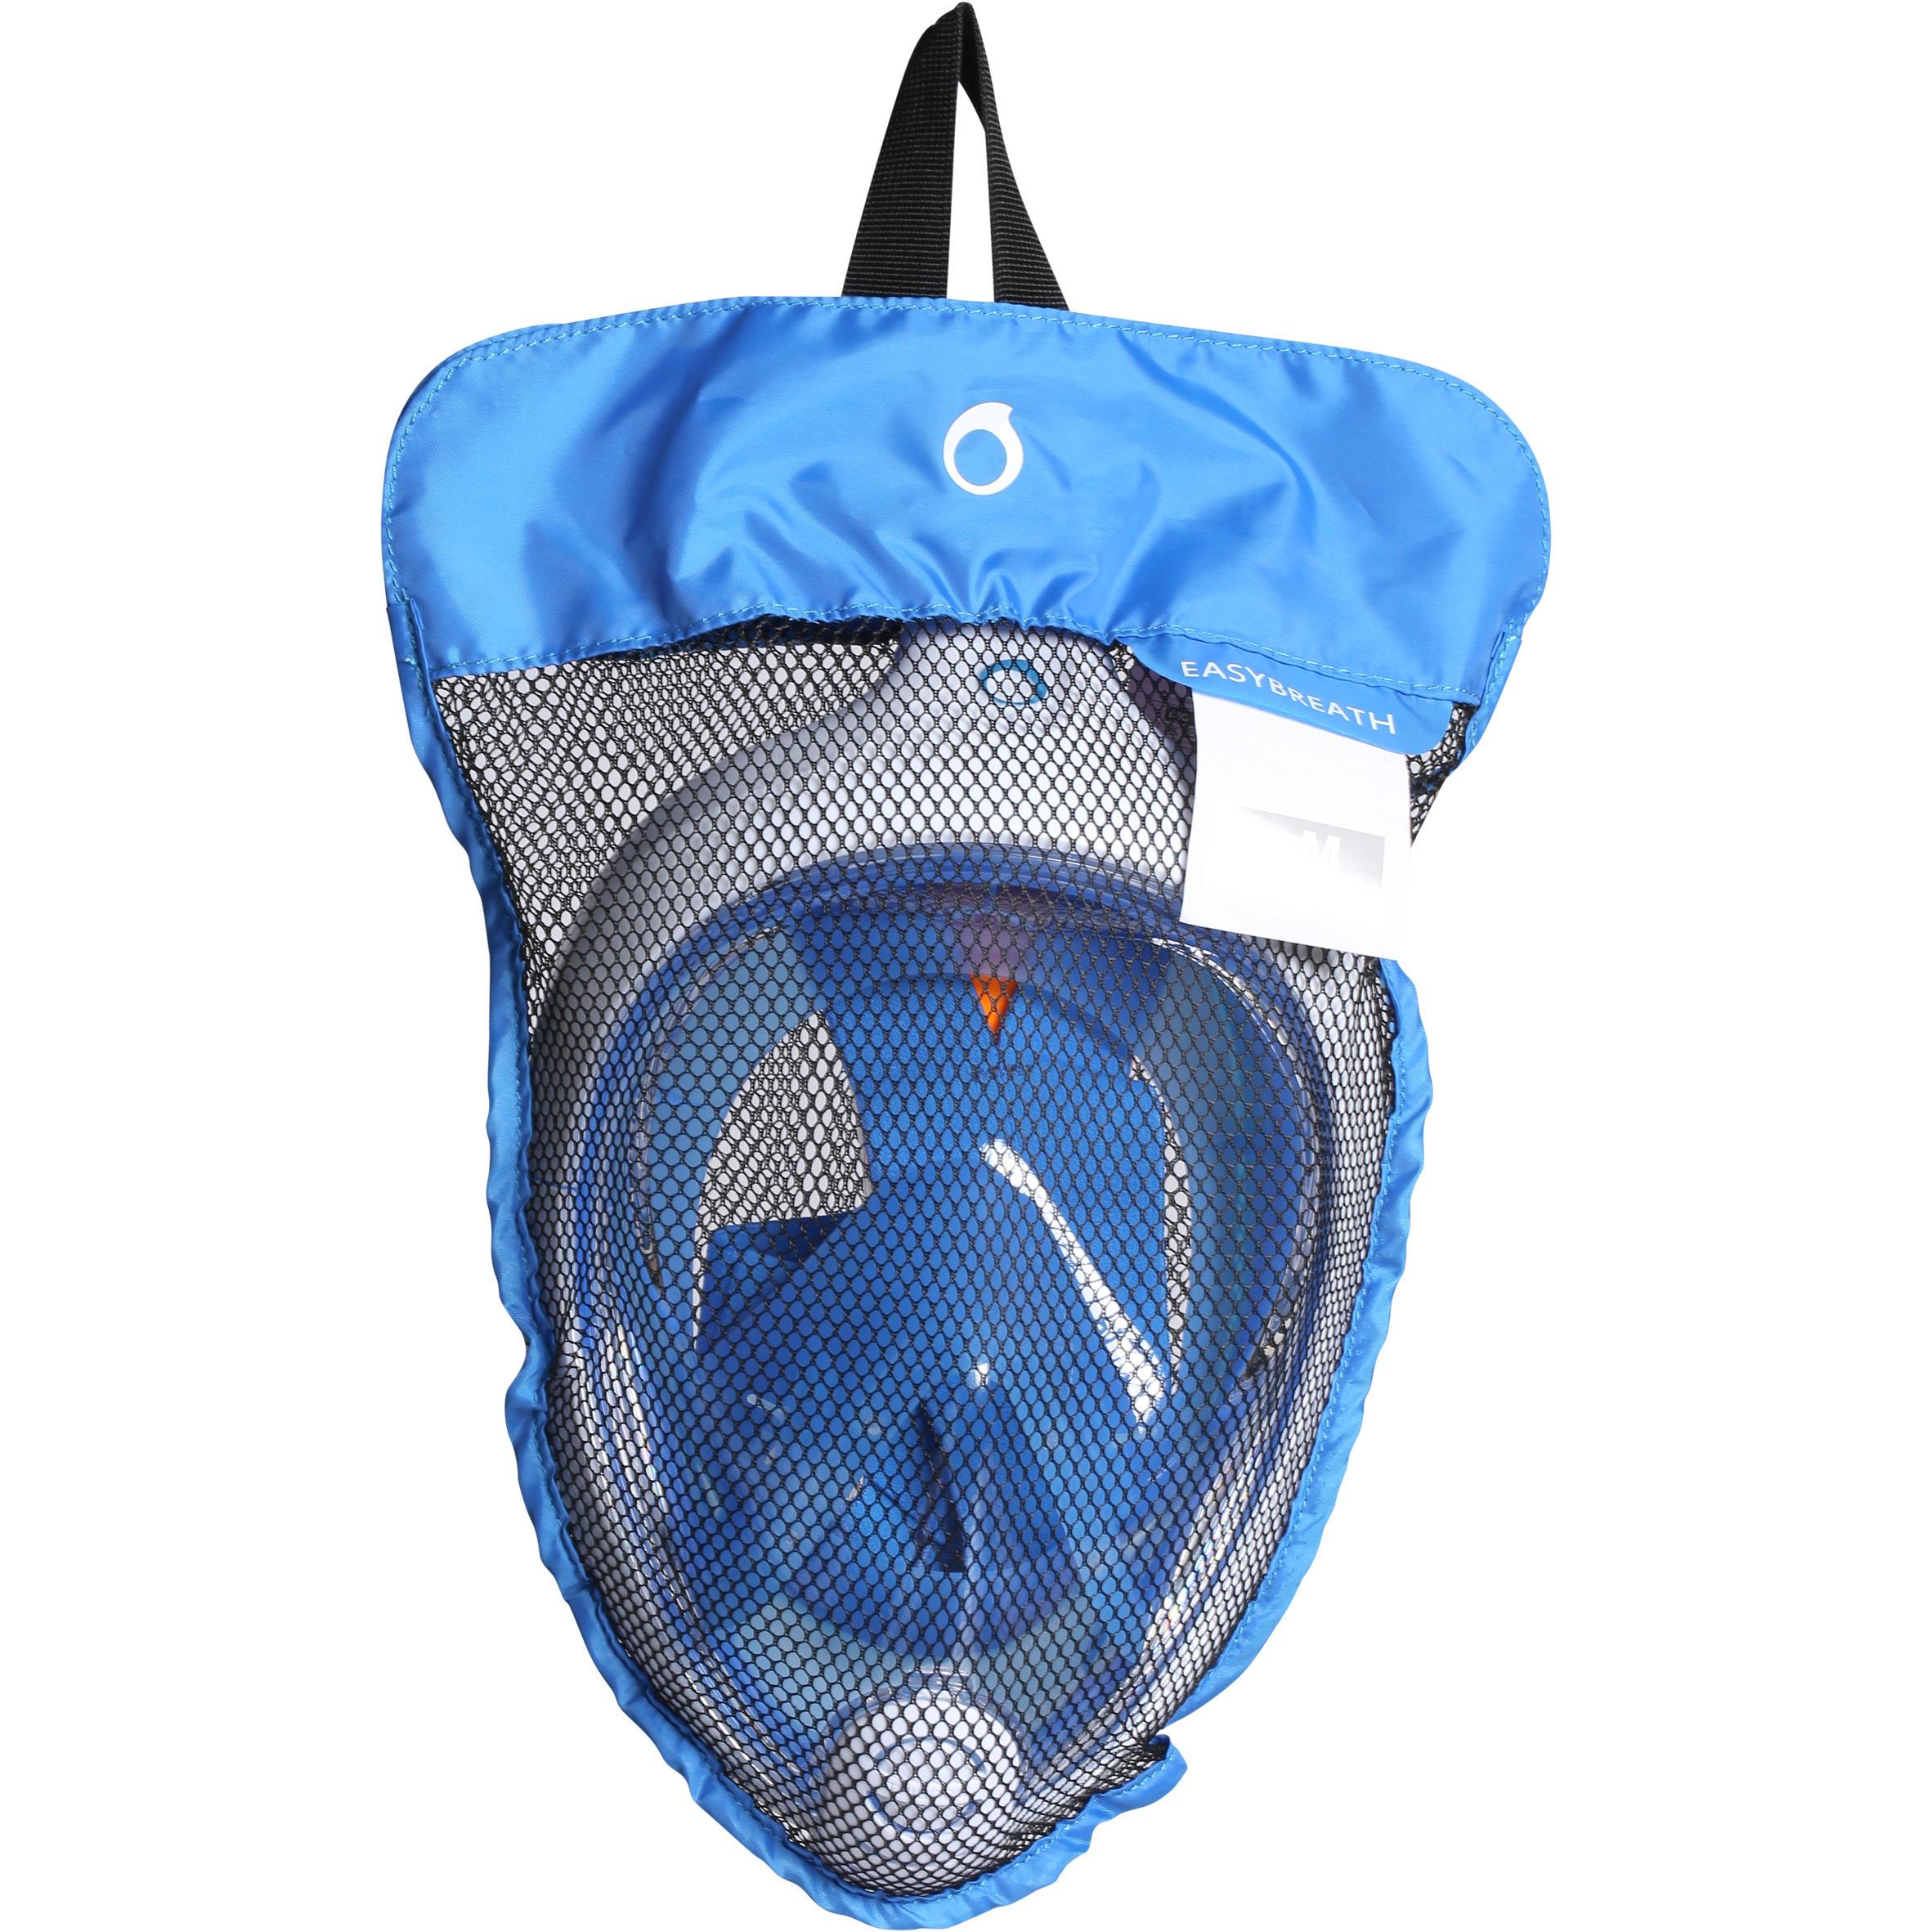 620076f4e Máscara de snorkeling Easybreath® Azul Blanco - Decathlon